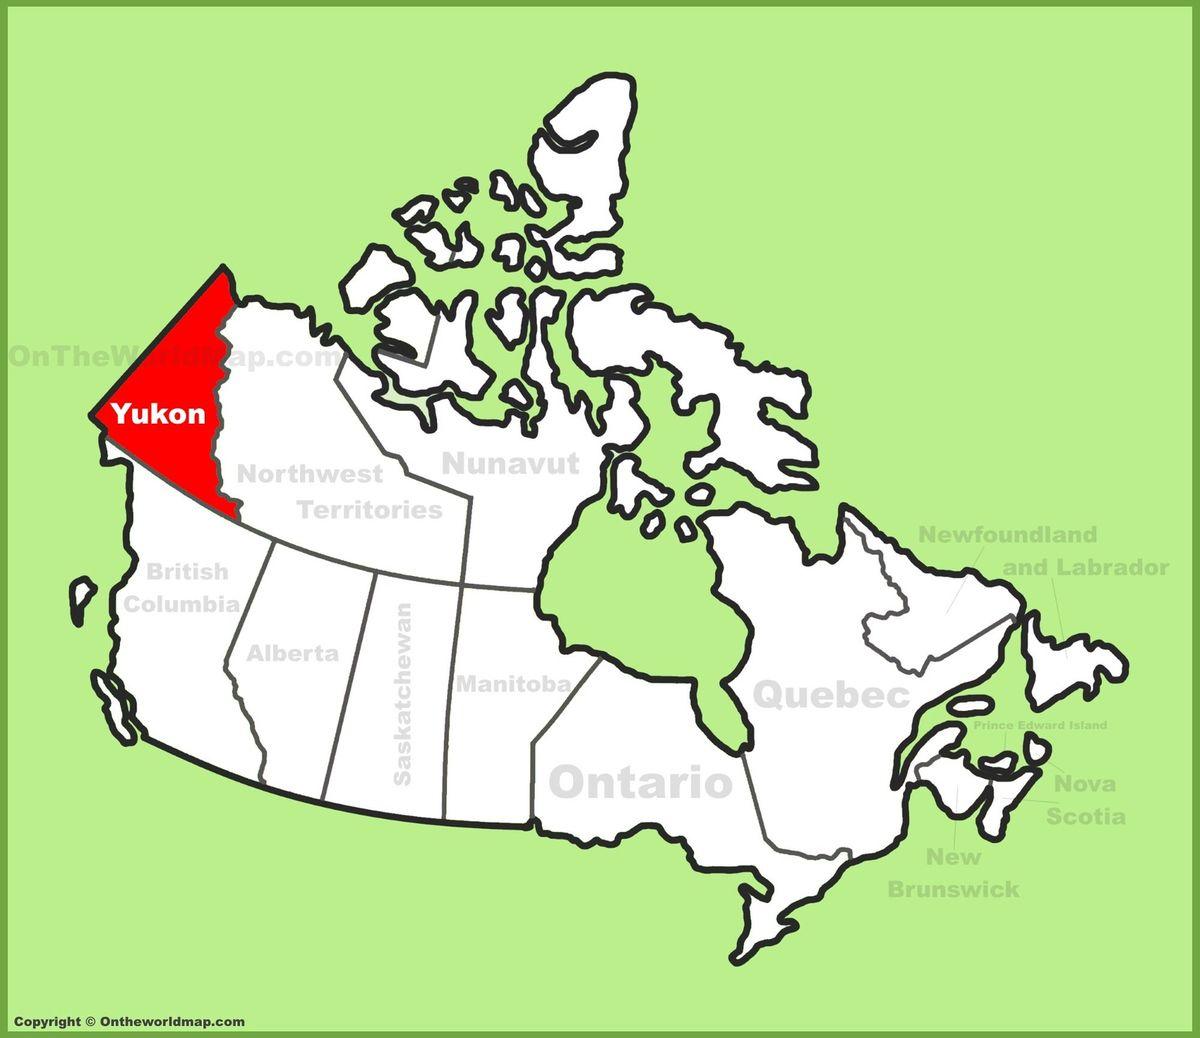 Canada - Celui qui arrivait au Yukon